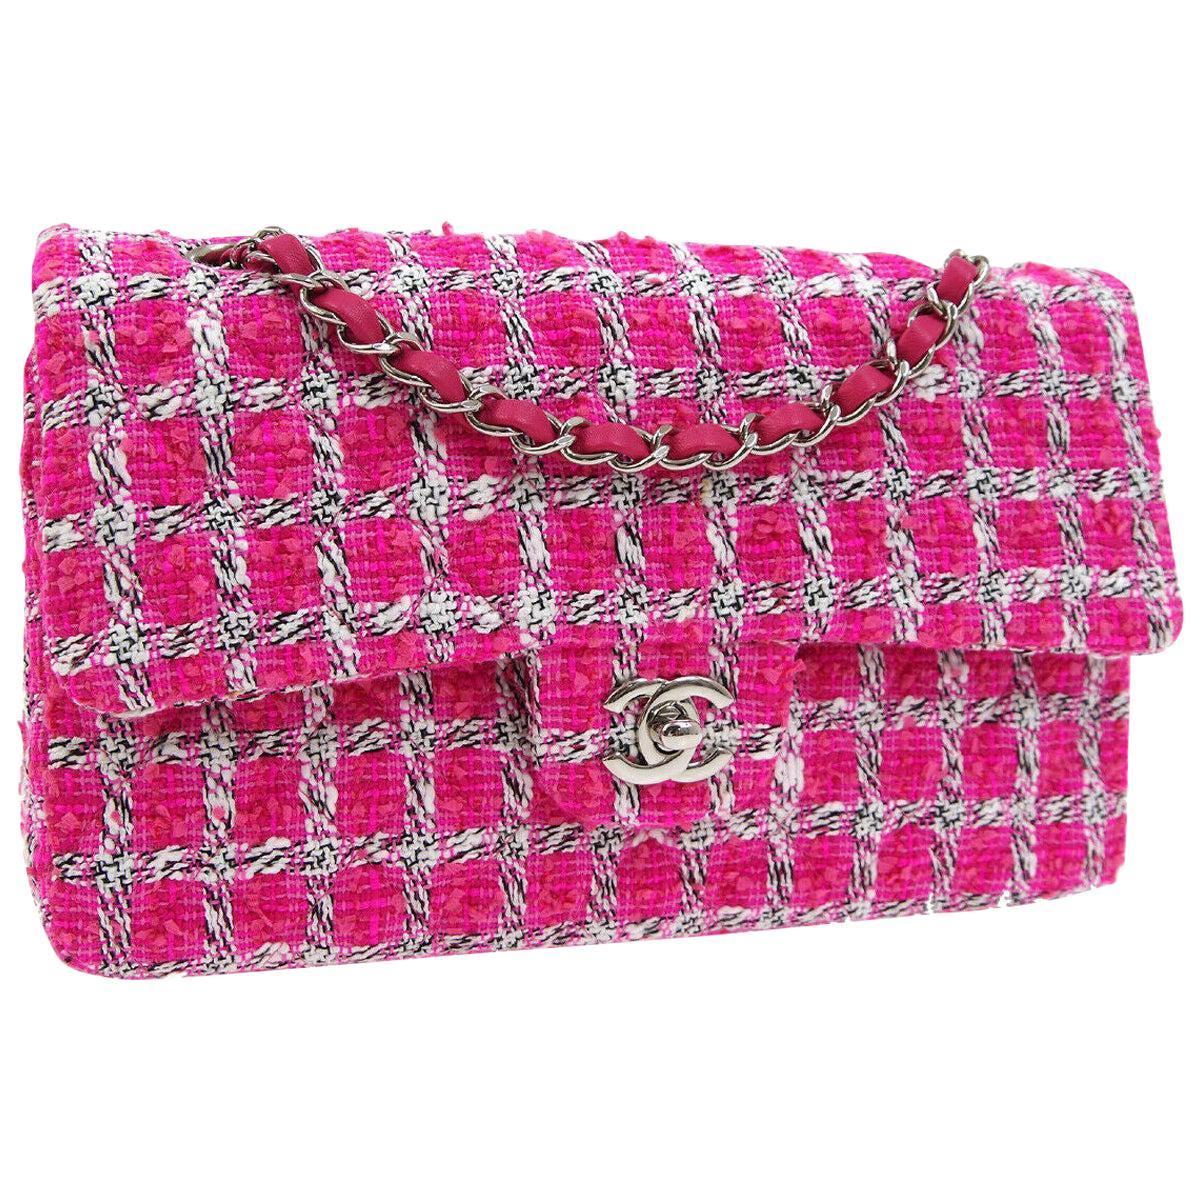 Chanel Pink White Black Tweed Checker Leather Silver Evening Shoulder Flap Bag